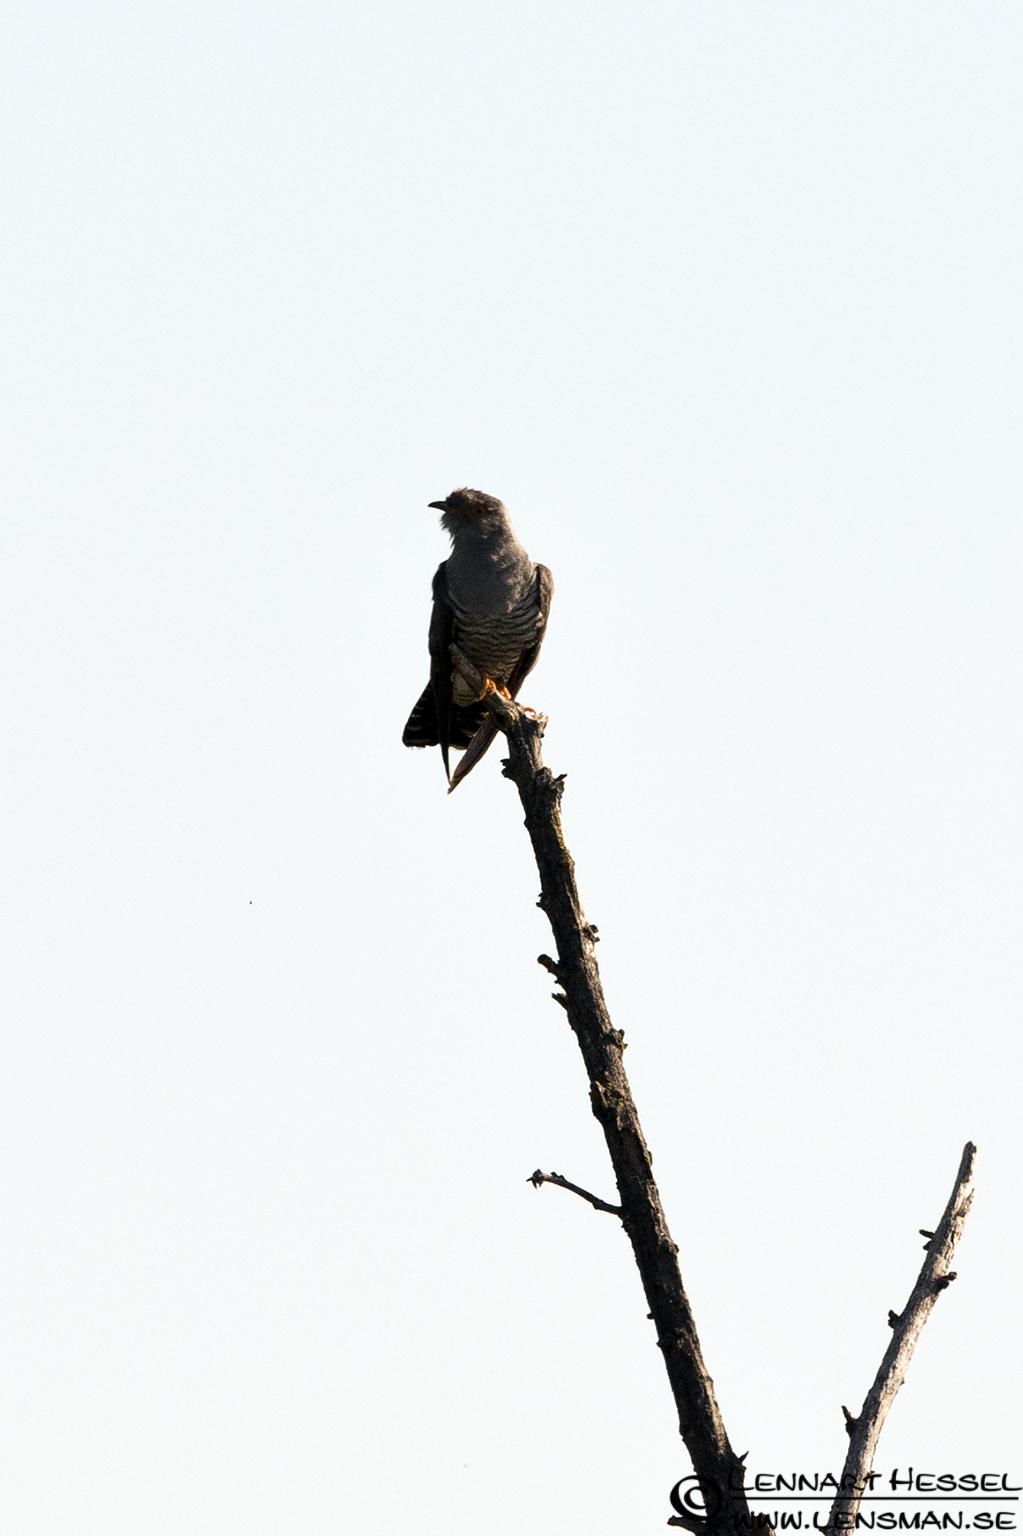 Cuckoo in Hungary